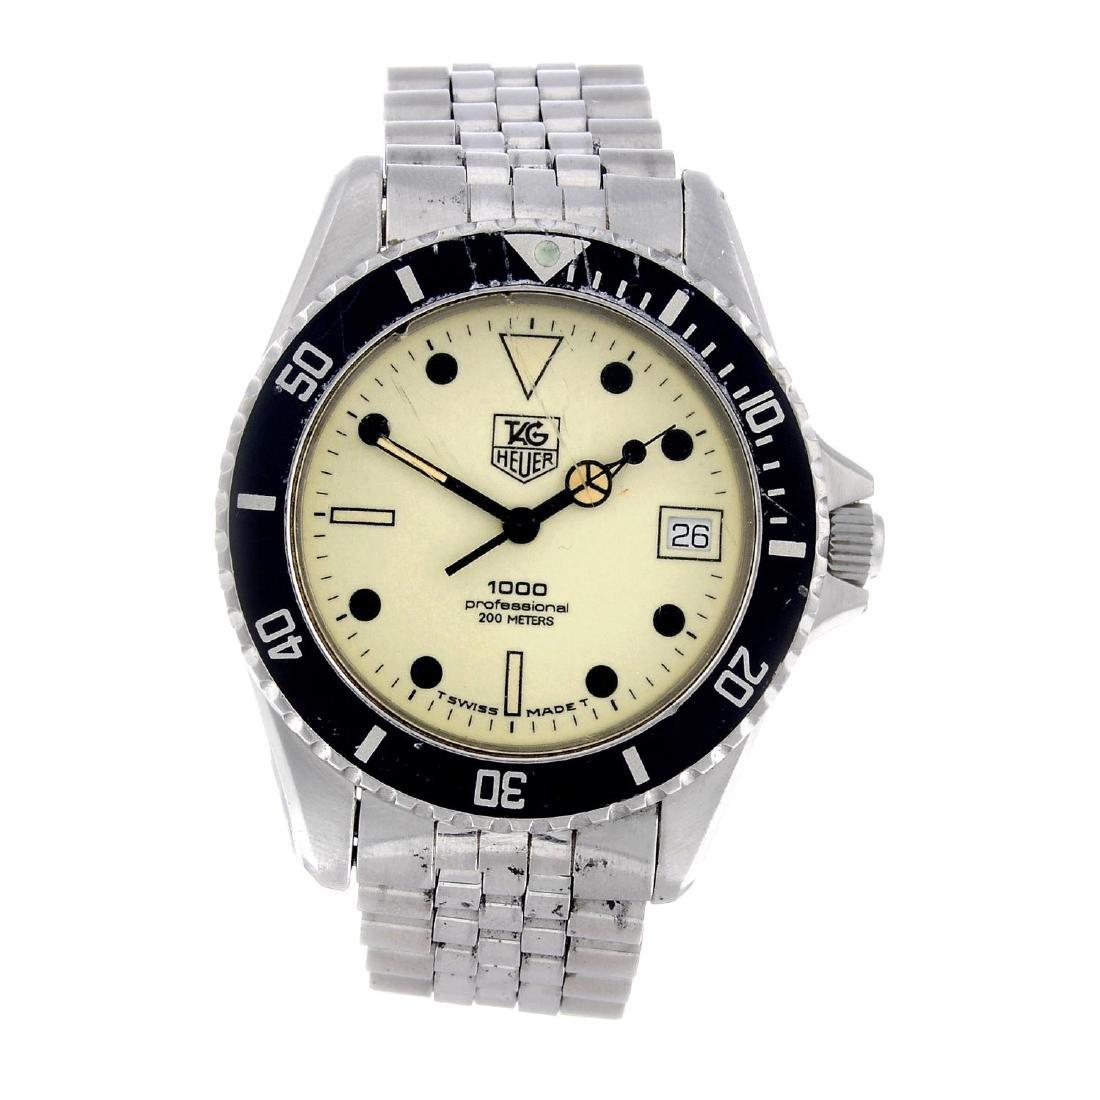 TAG HEUER - a gentleman's 1000 bracelet watch.